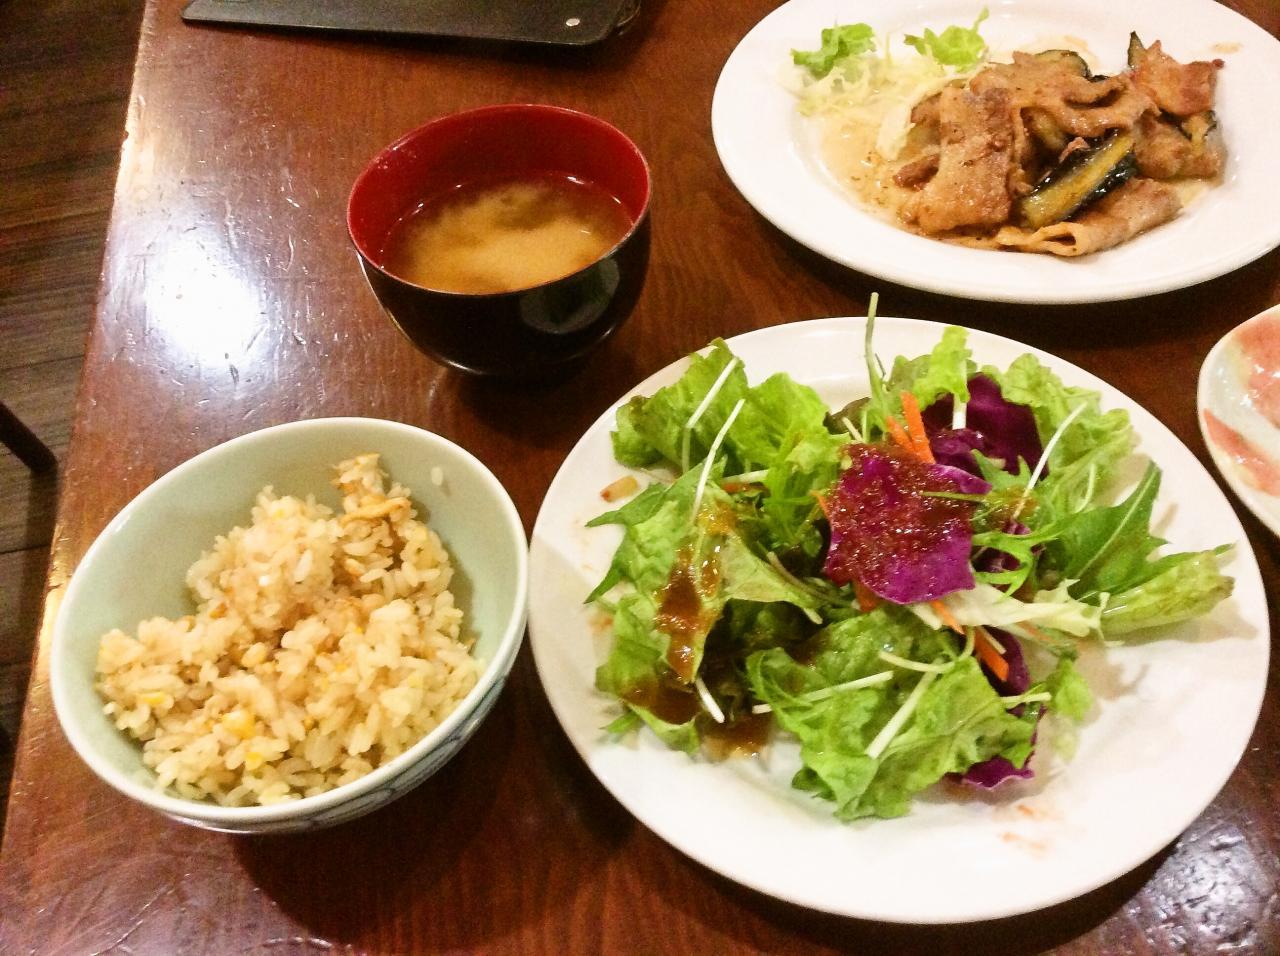 BIERREISE'98(料理)